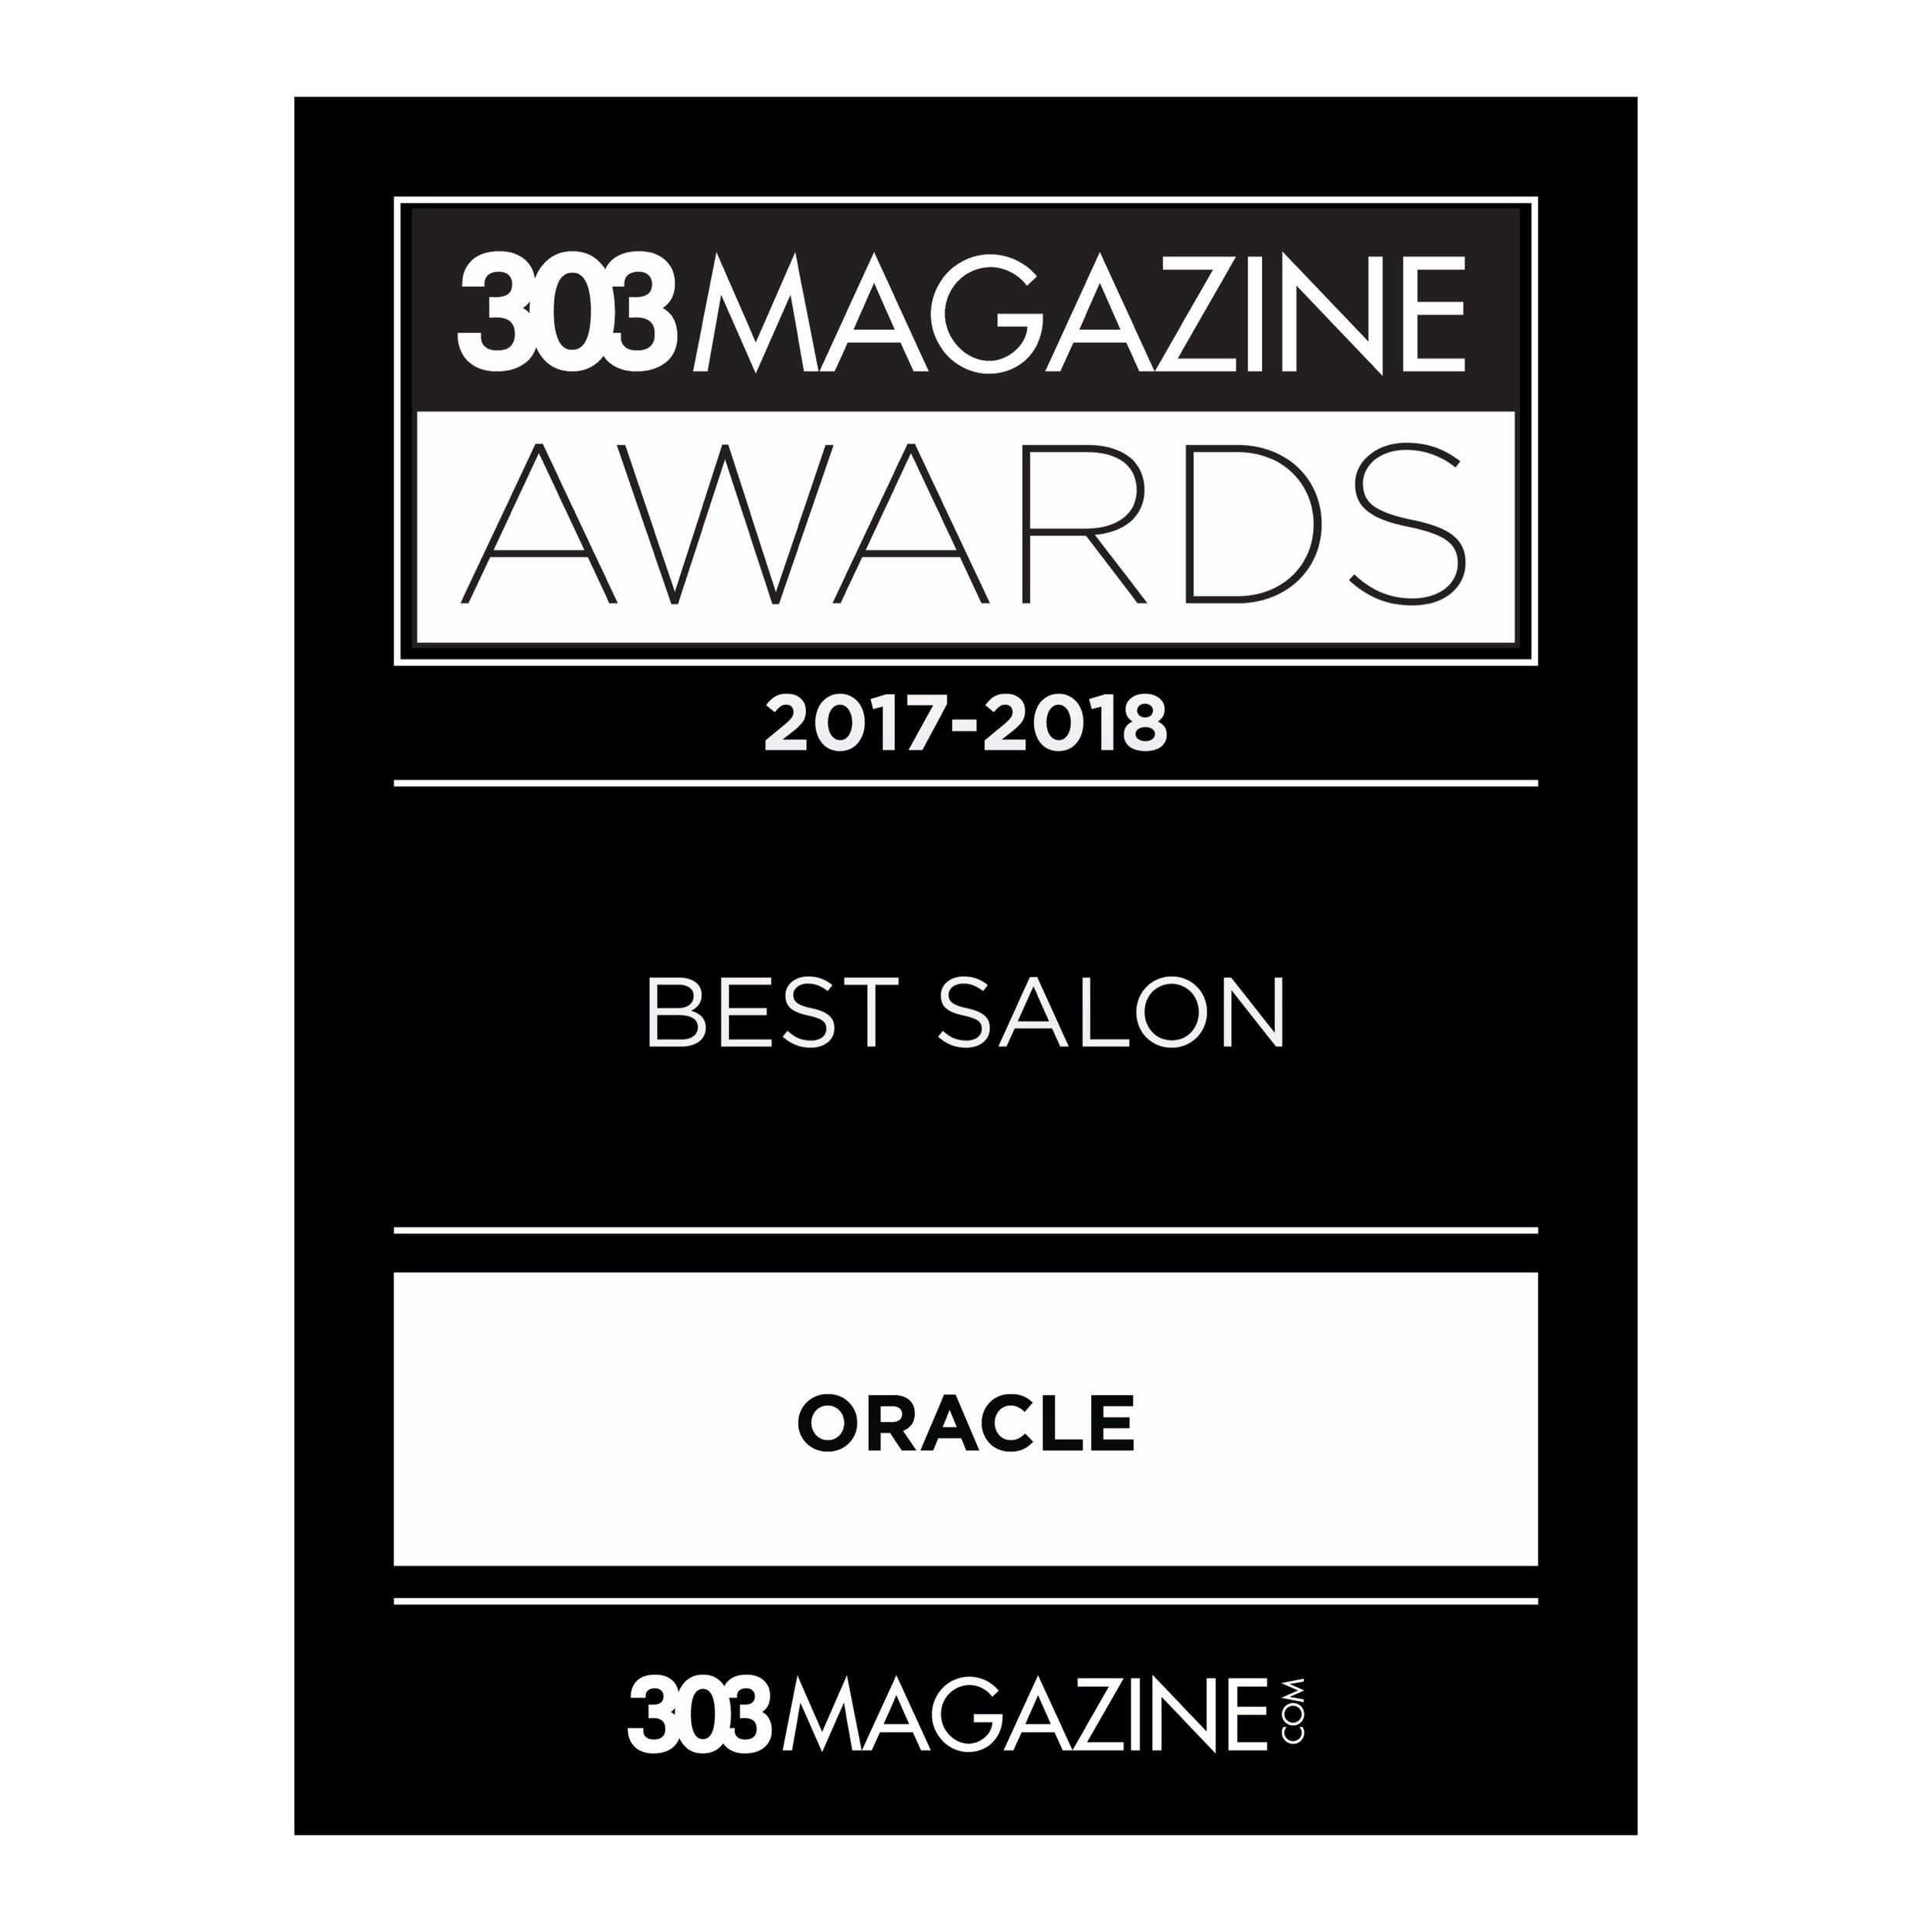 Oracle WON Best Salon 2018!